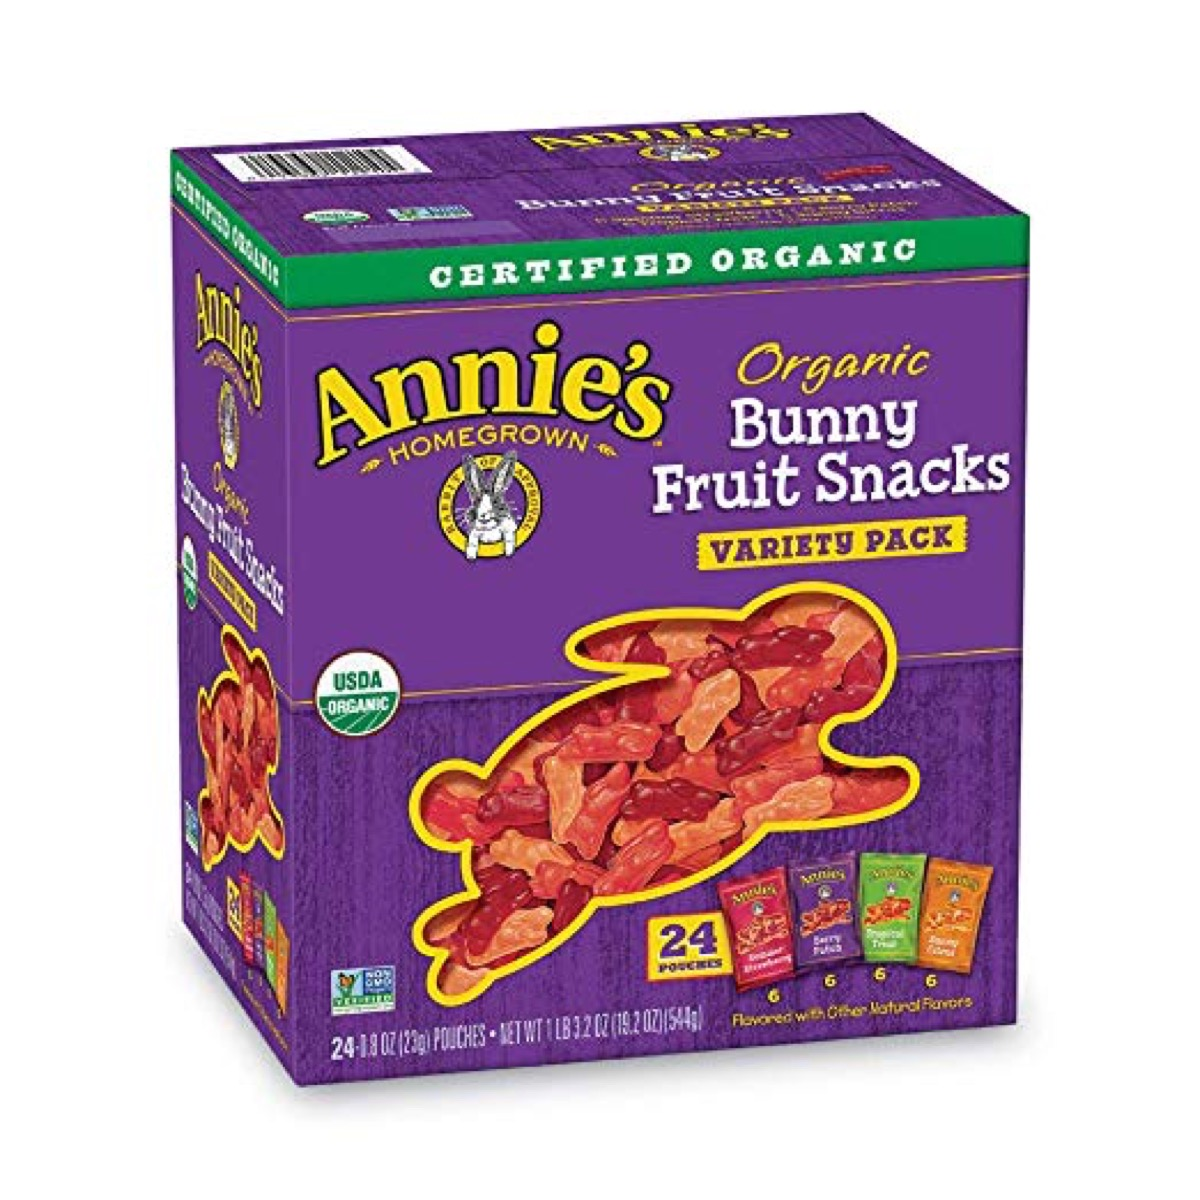 annie's bunny fruit snacks, peanut free preschool snacks